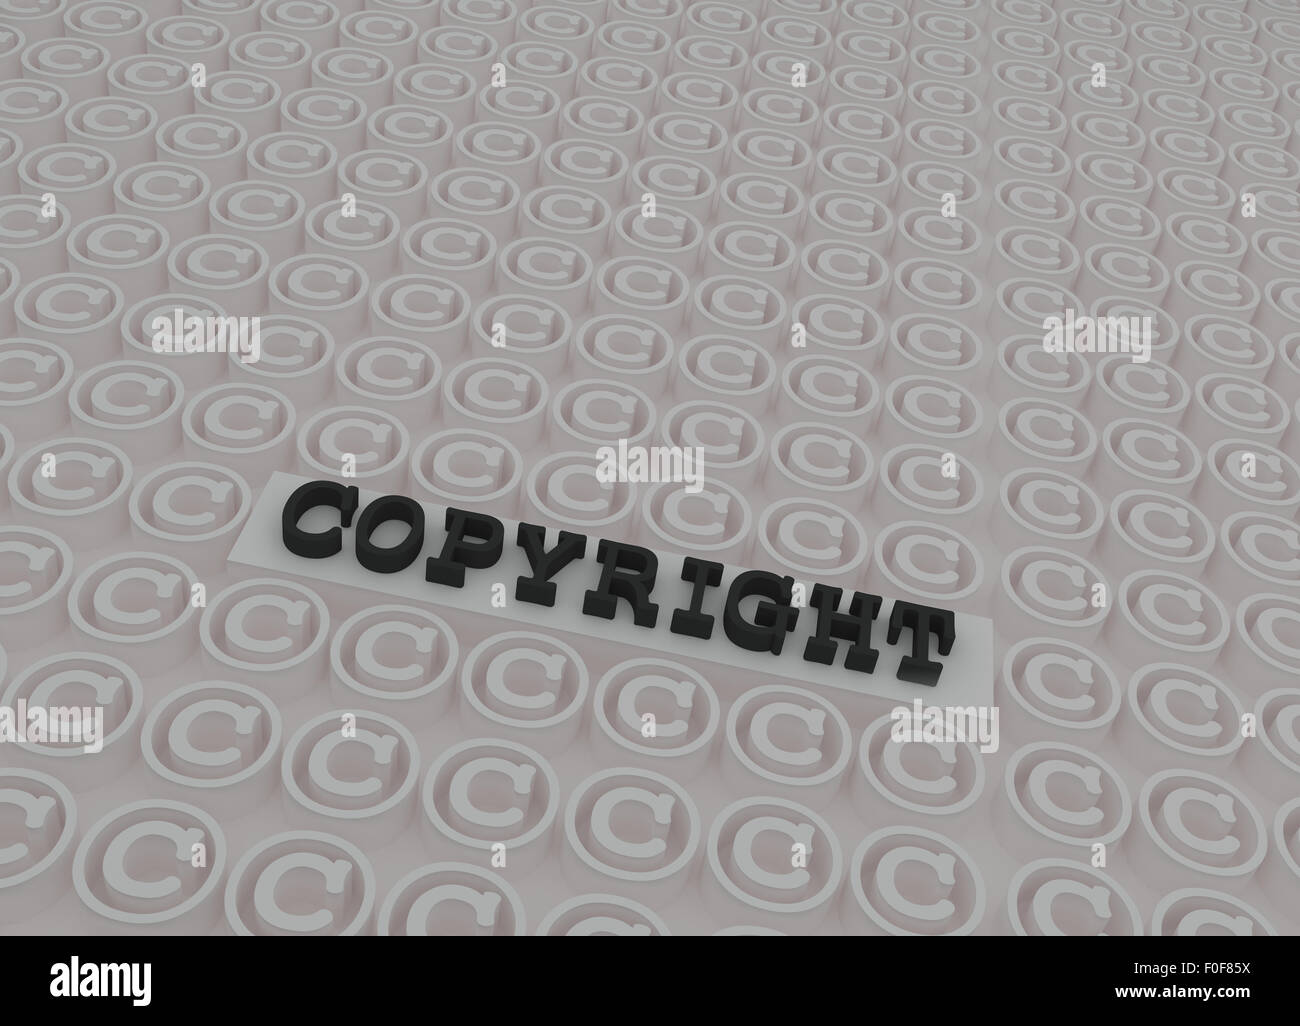 Negro 3d texto de copyright en la plataforma 3d interior copyright símbolos en blanco. Foto de stock